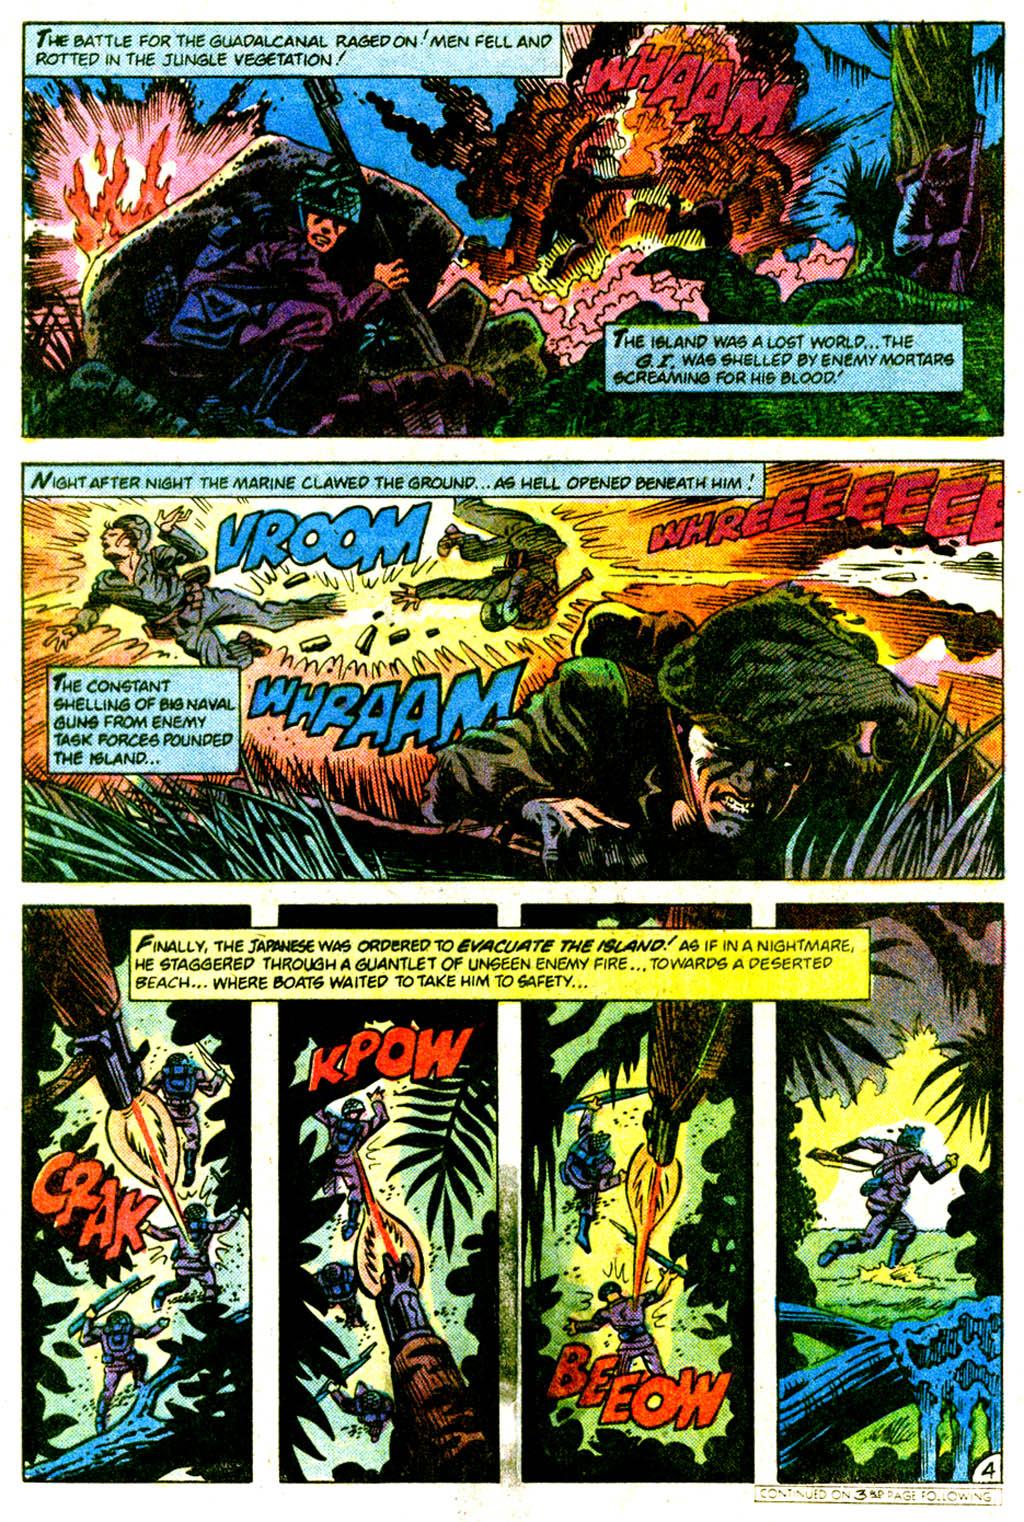 Read online Sgt. Rock comic -  Issue #375 - 27